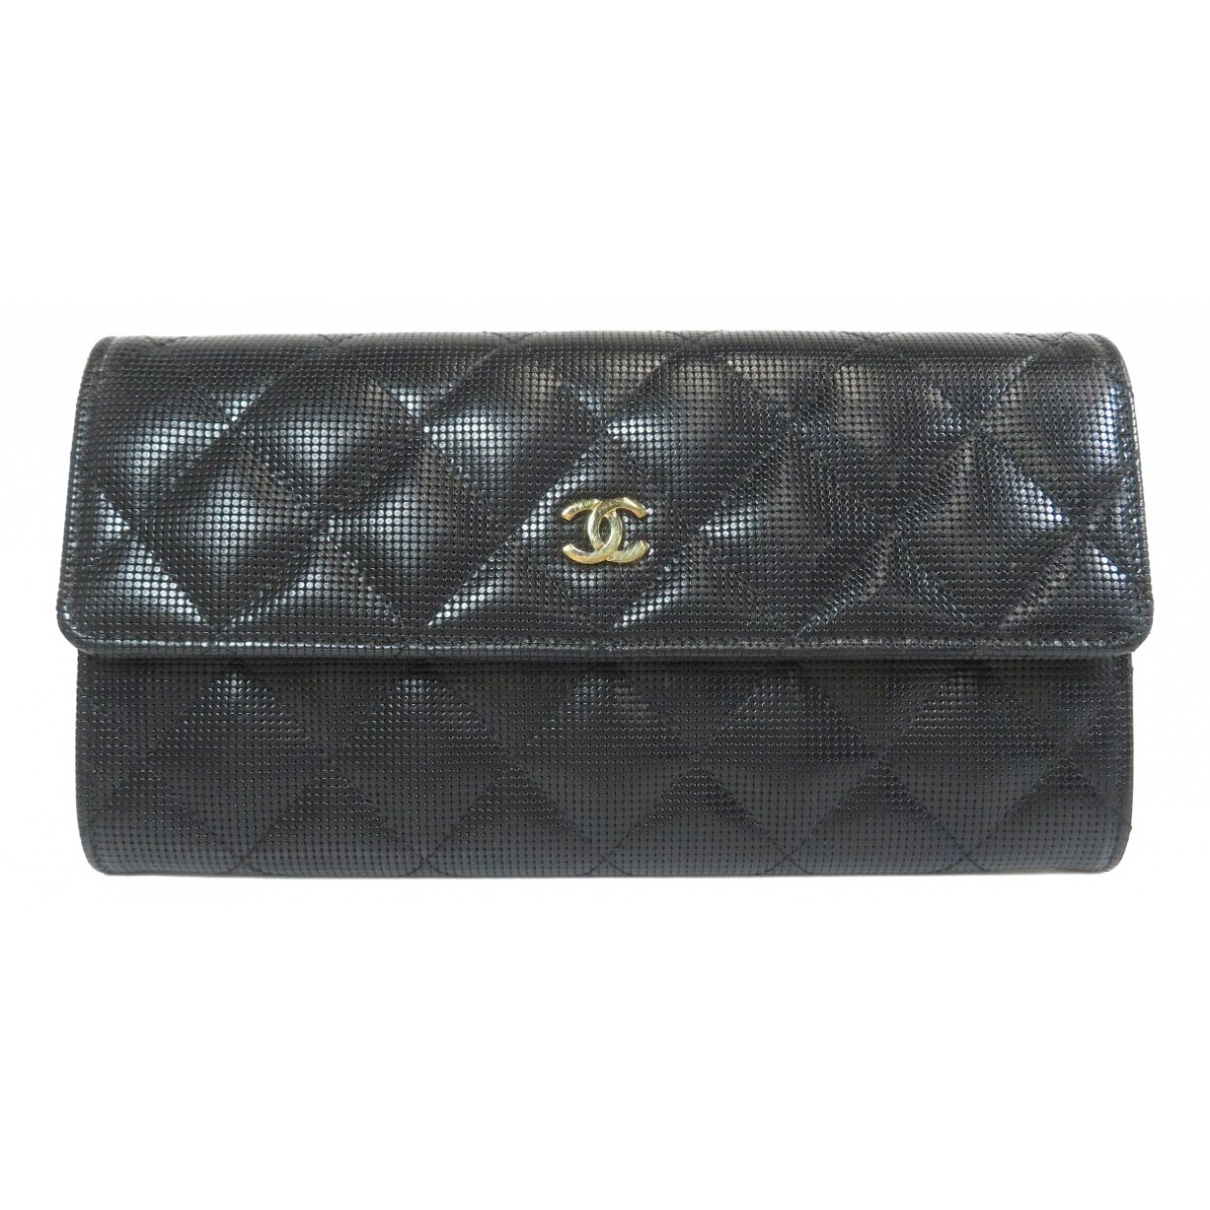 Chanel Timeless/Classique Portemonnaie in  Schwarz Leder